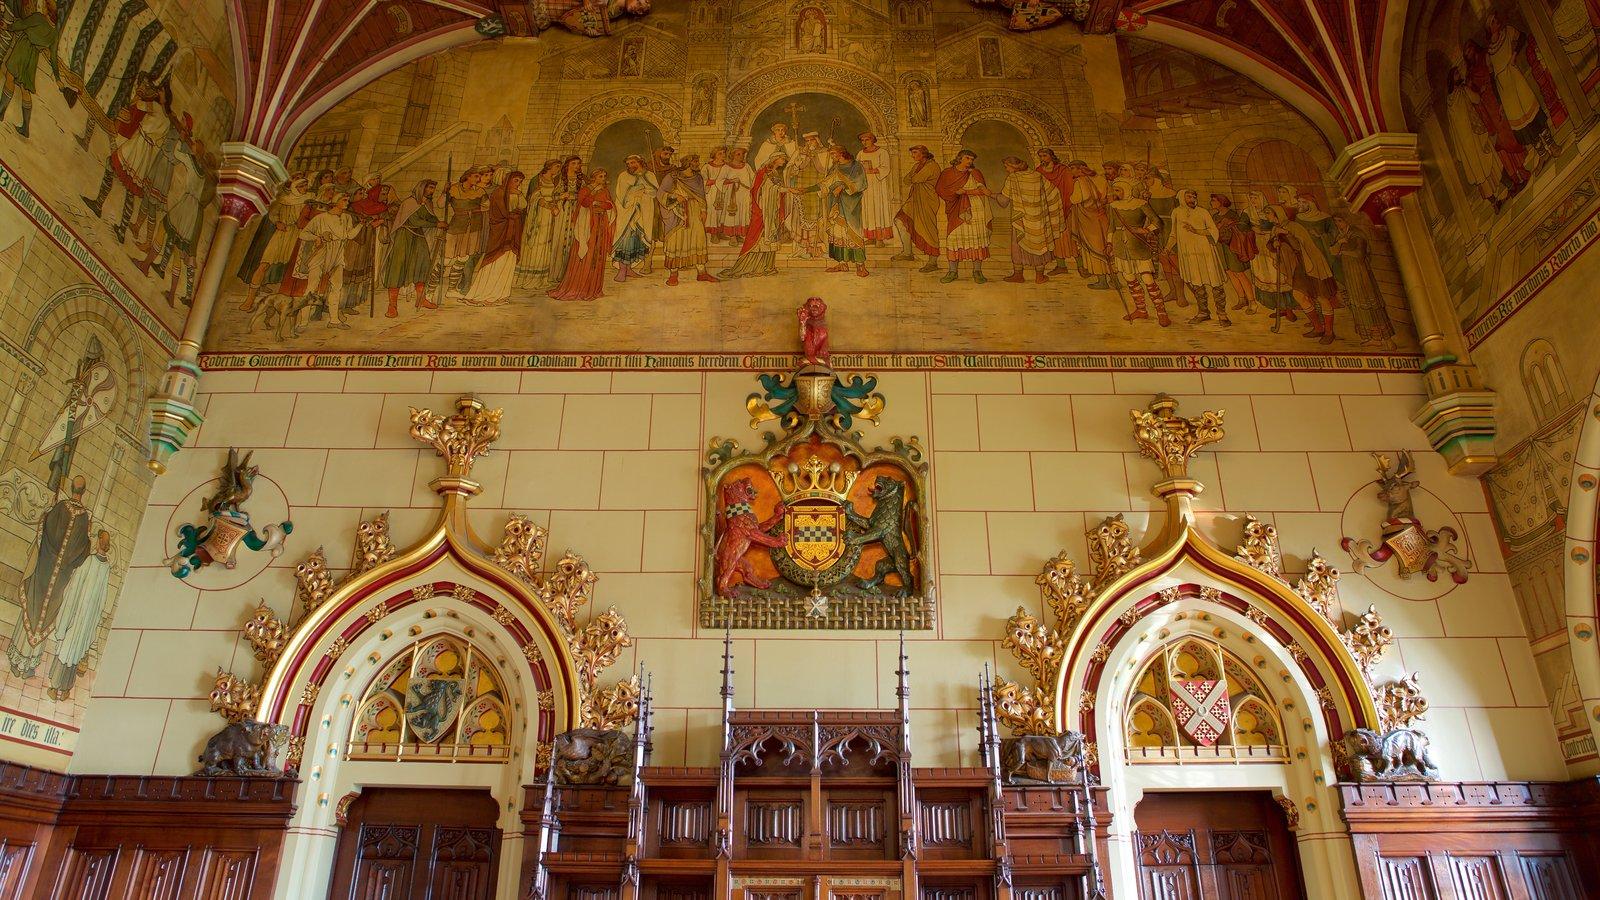 Castelo de Cardiff que inclui elementos de patrimônio, vistas internas e arquitetura de patrimônio